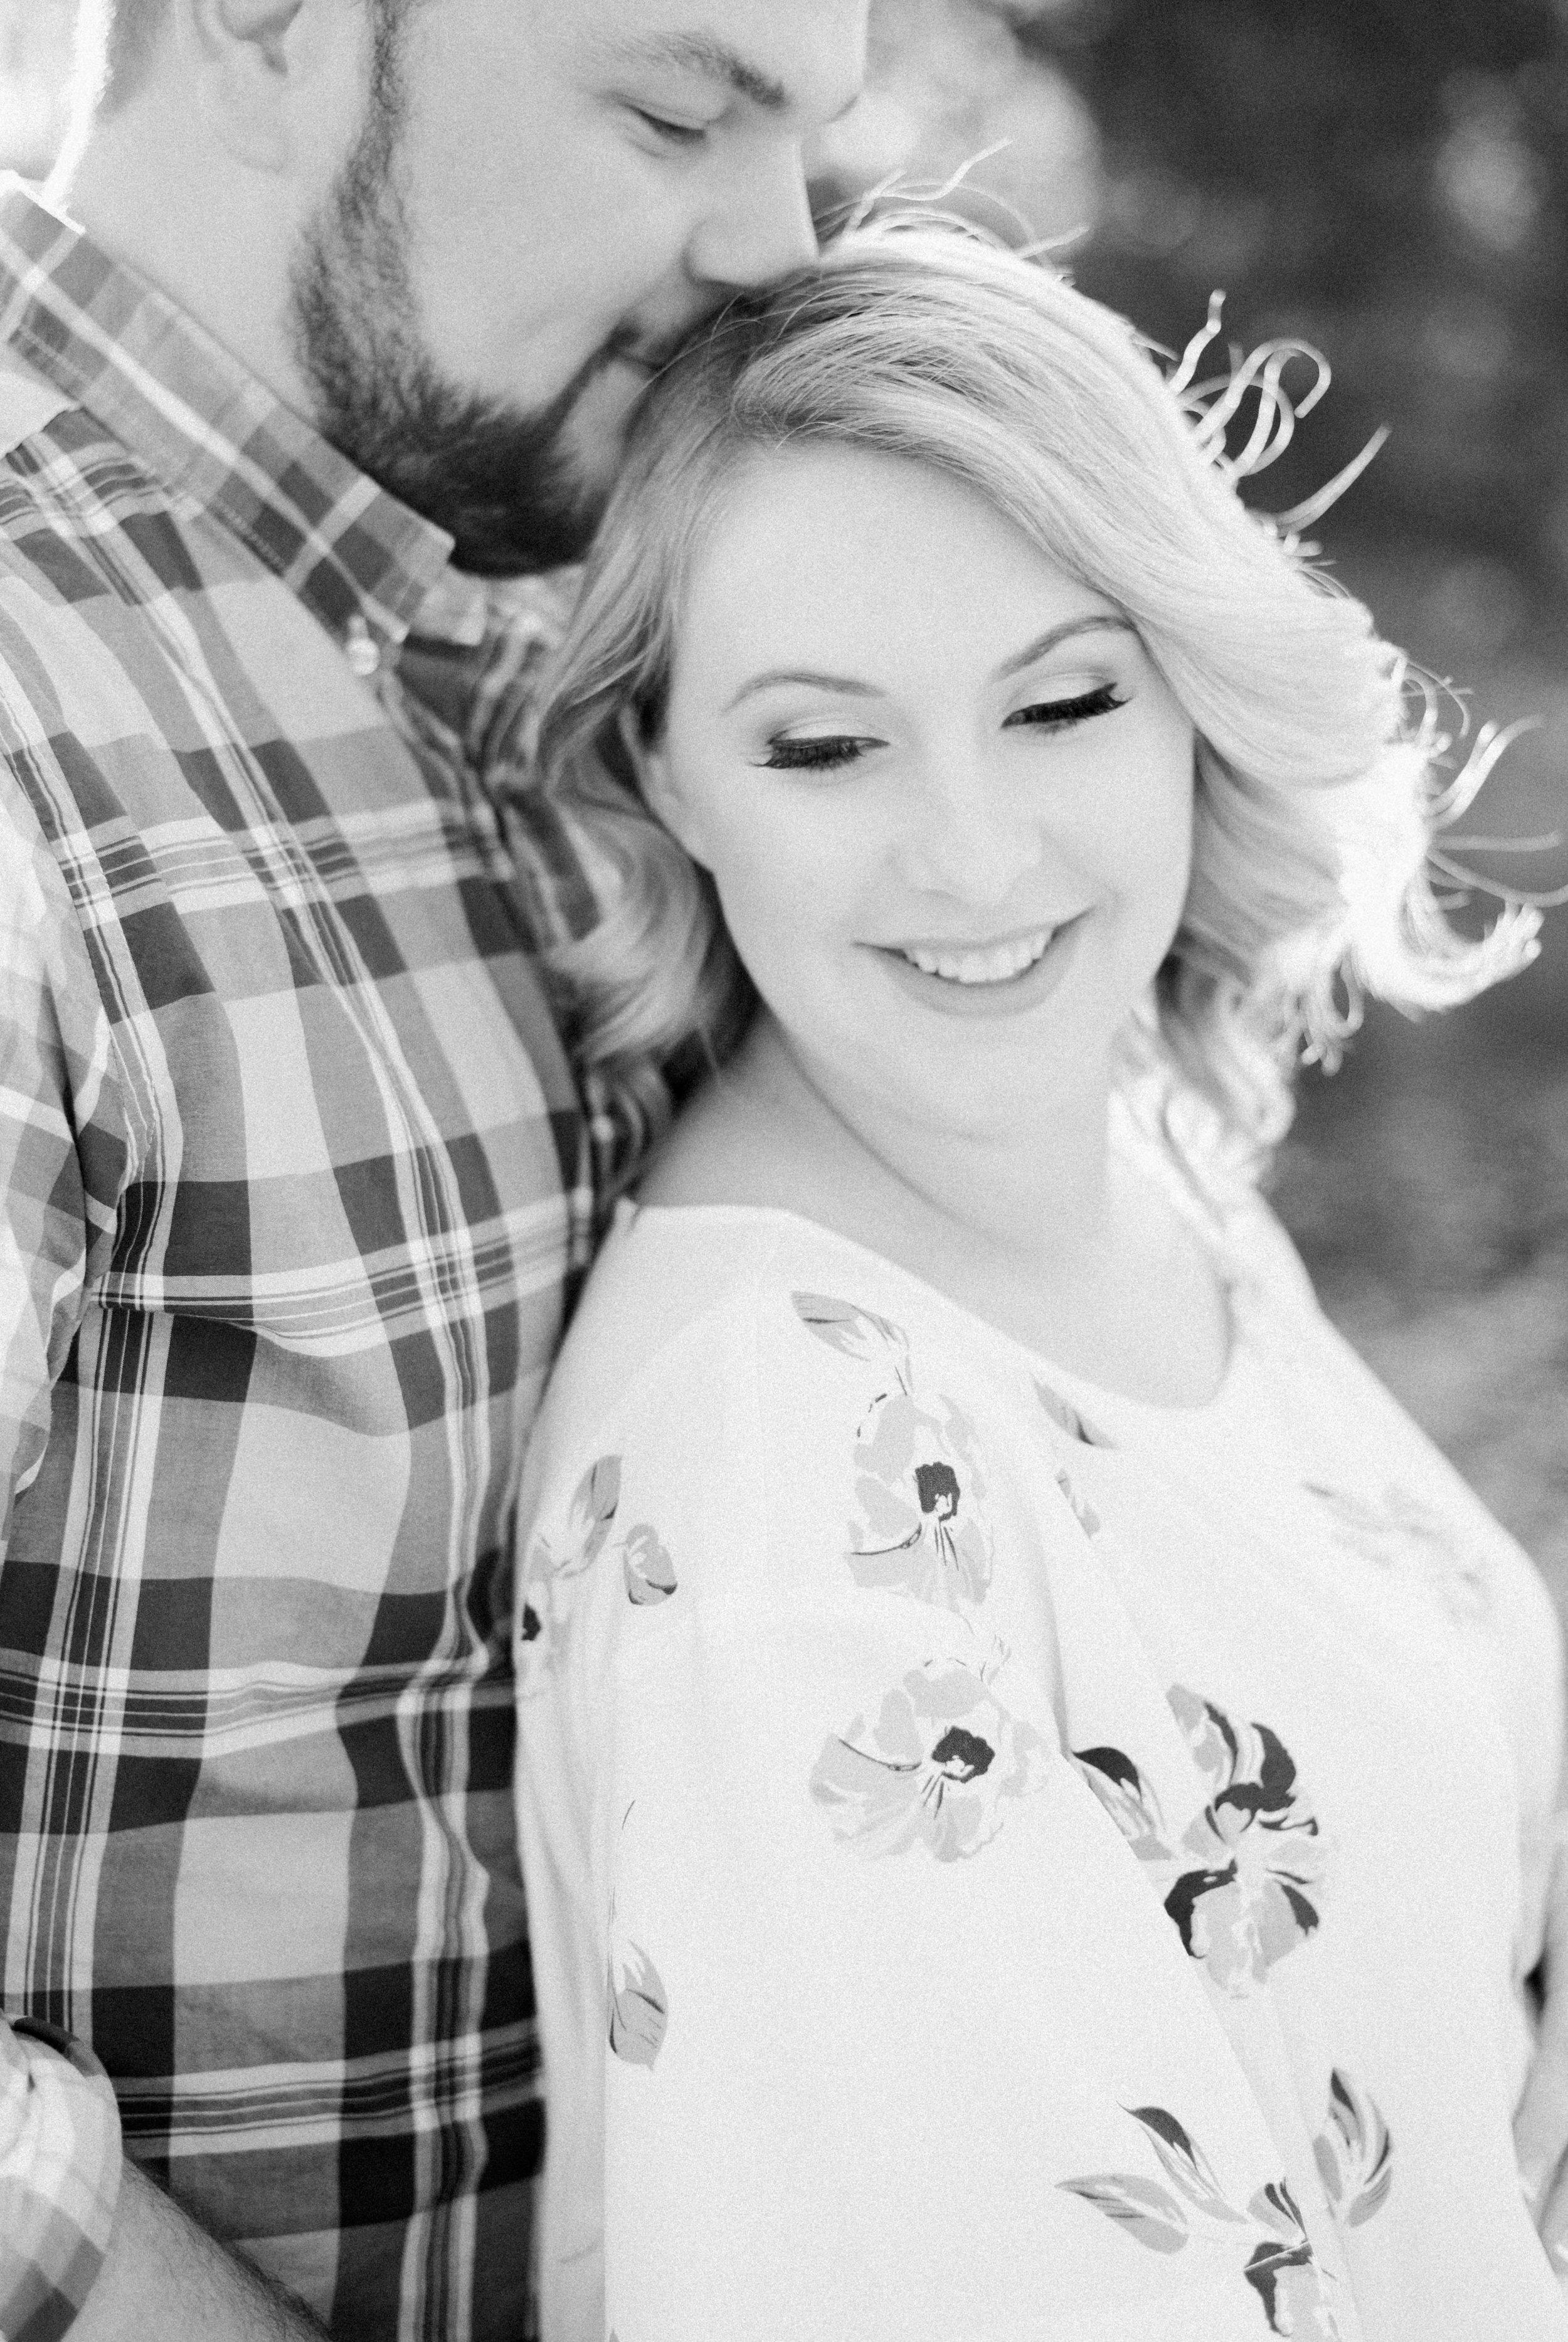 SorellaFarms_Jessica+Dylan_MaternitySession_Virginiaweddingphotographer 11.jpg